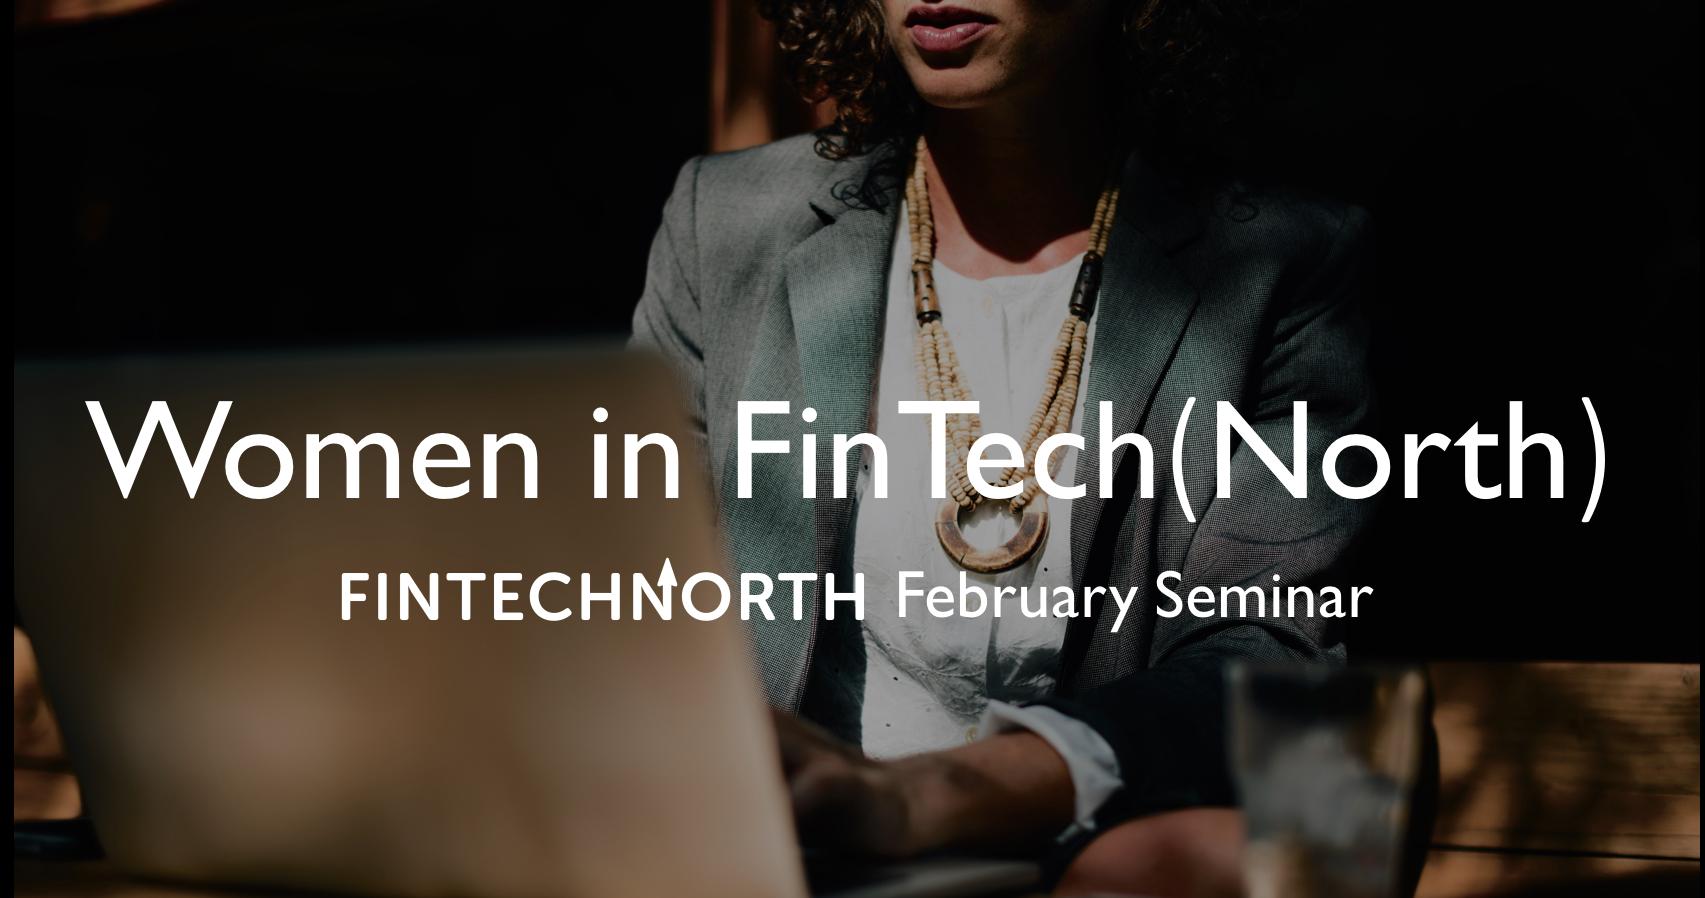 FinTech North February Seminar - Women in Fin